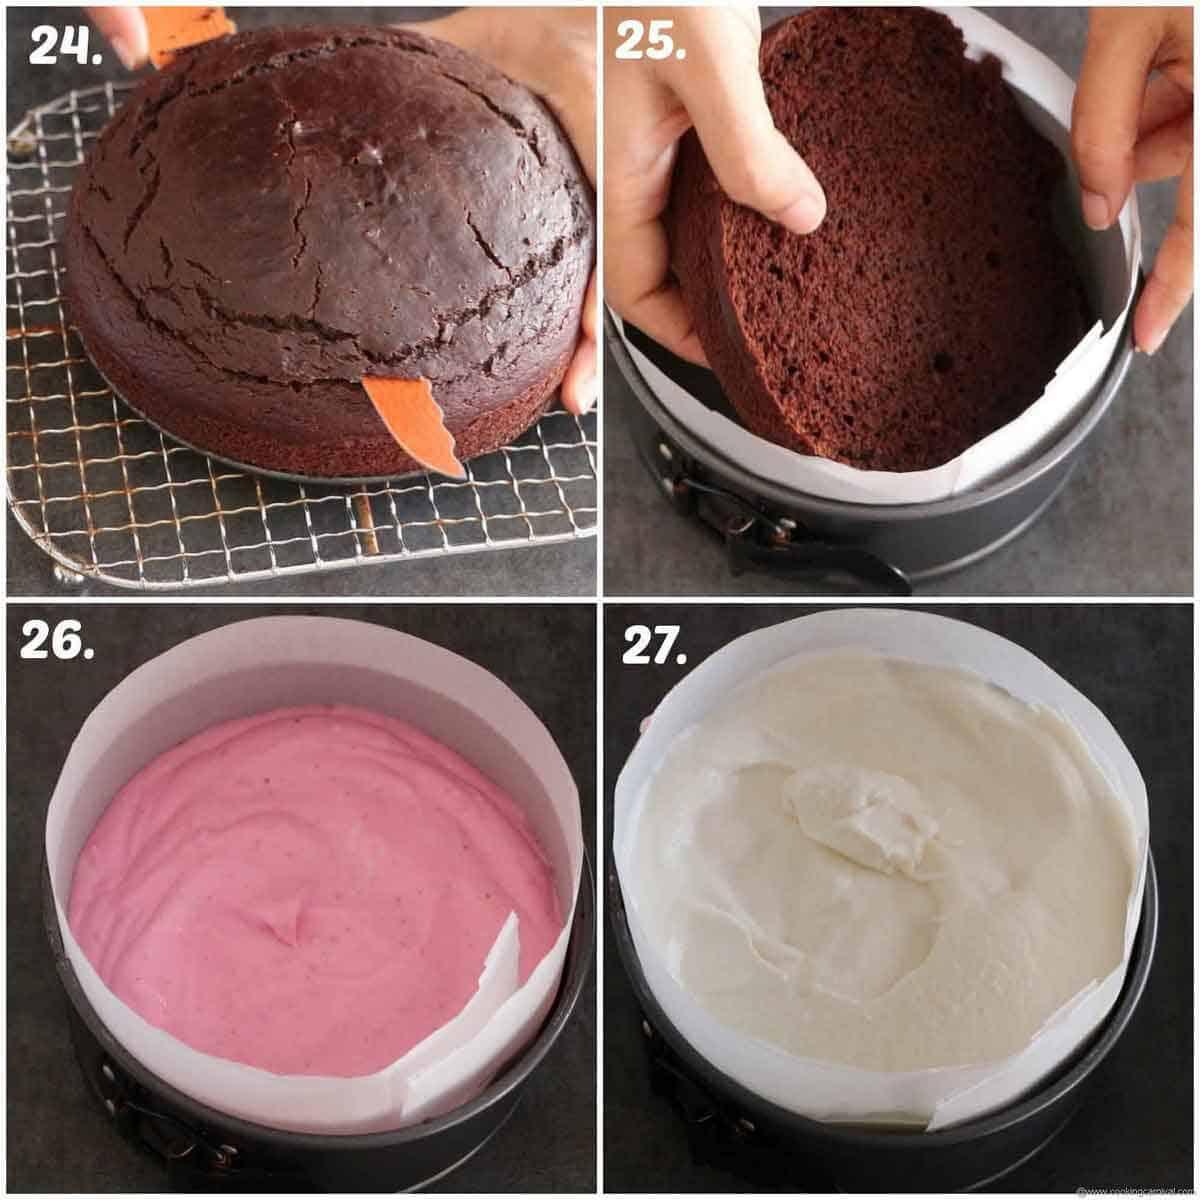 Layering the ice cream cake